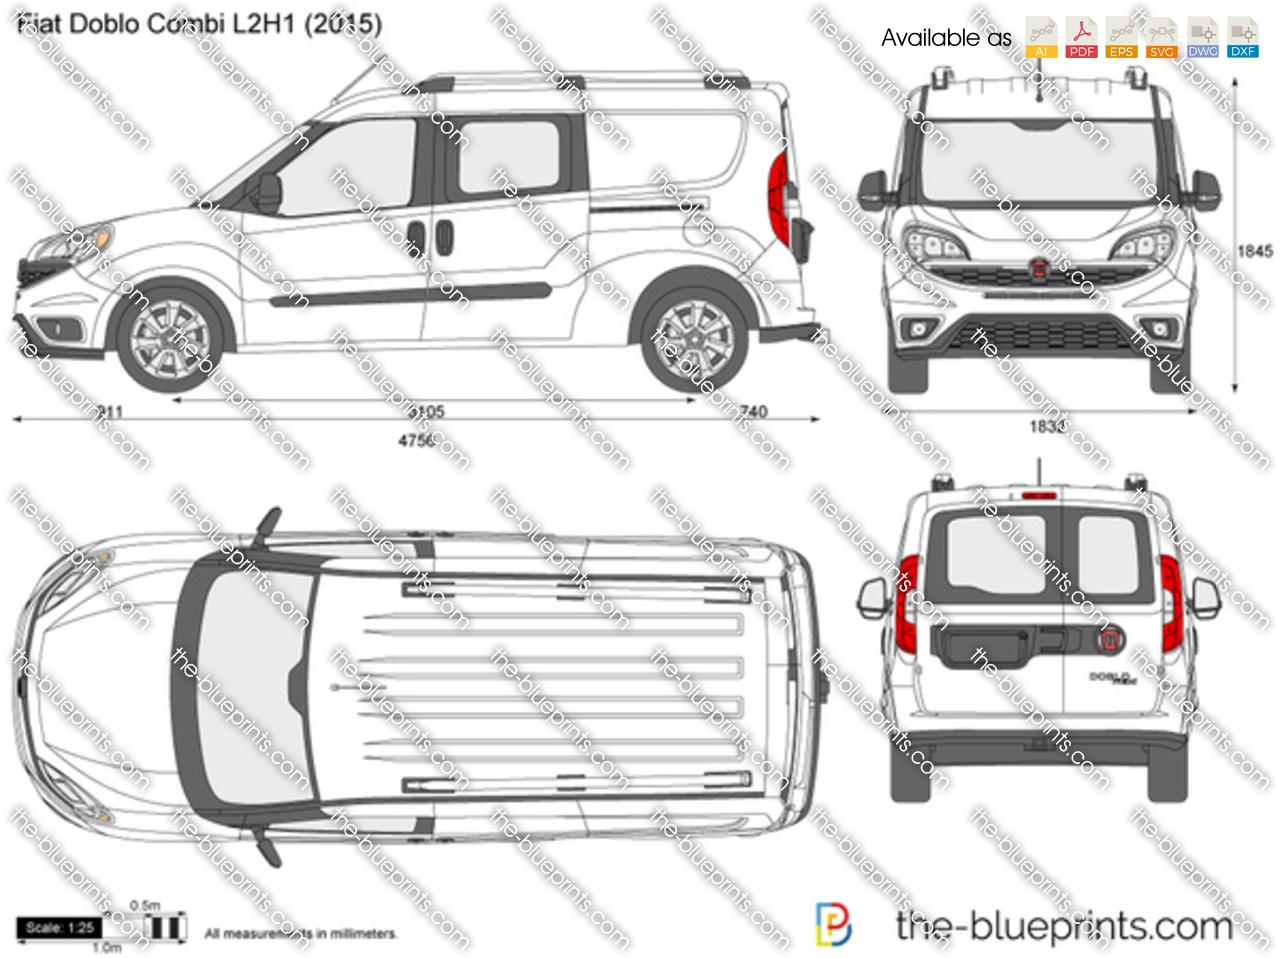 Fiat Doblo Combi L2H1